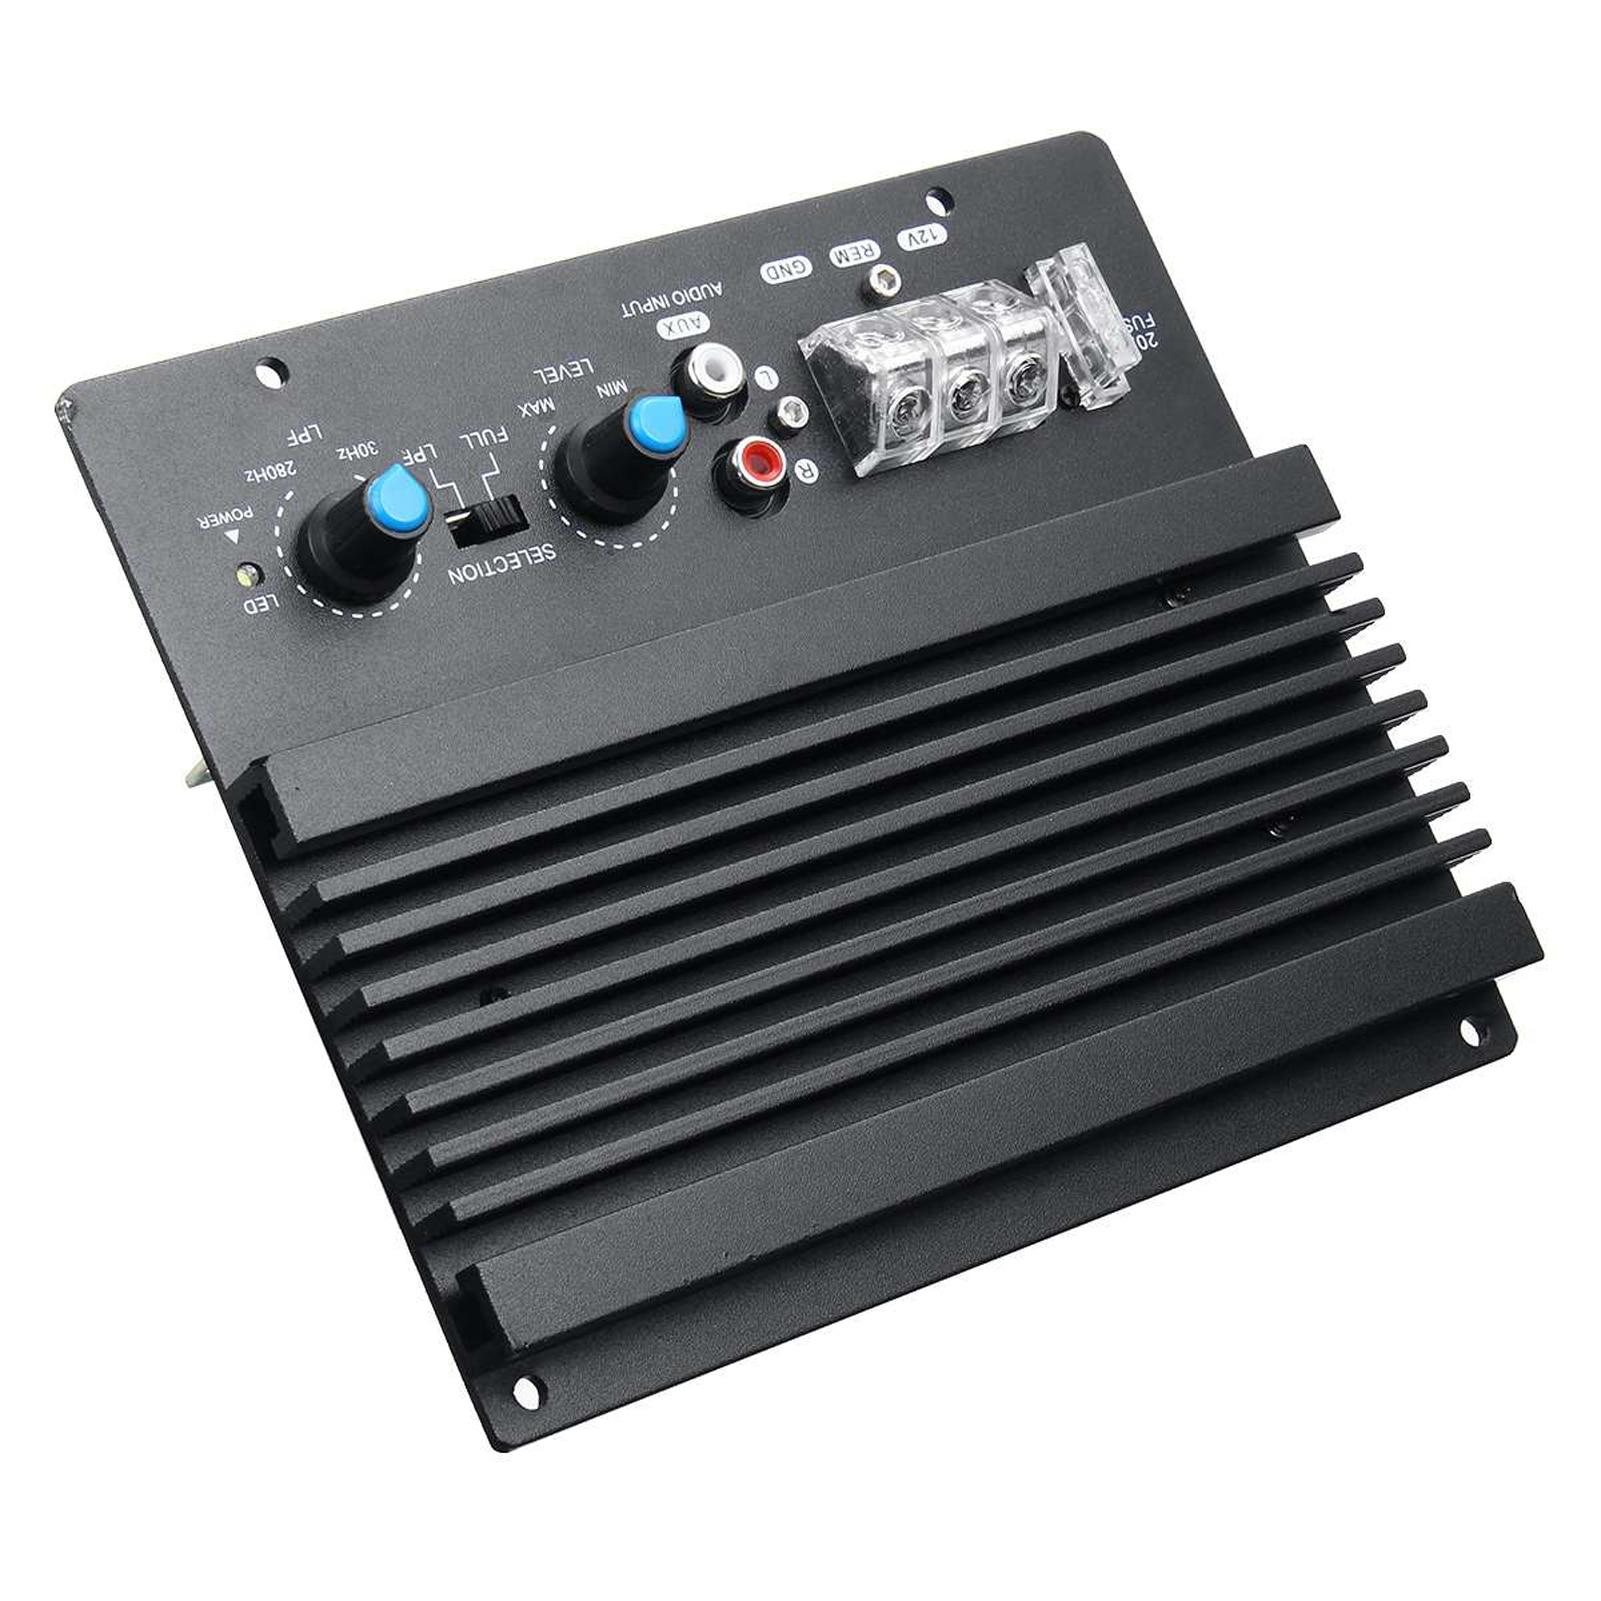 12V Large Power Car Audio Amplifier Powerful Bass Subwoofer Amplifier Board Automotive Amplifier Module 3D Crystal Power 200W